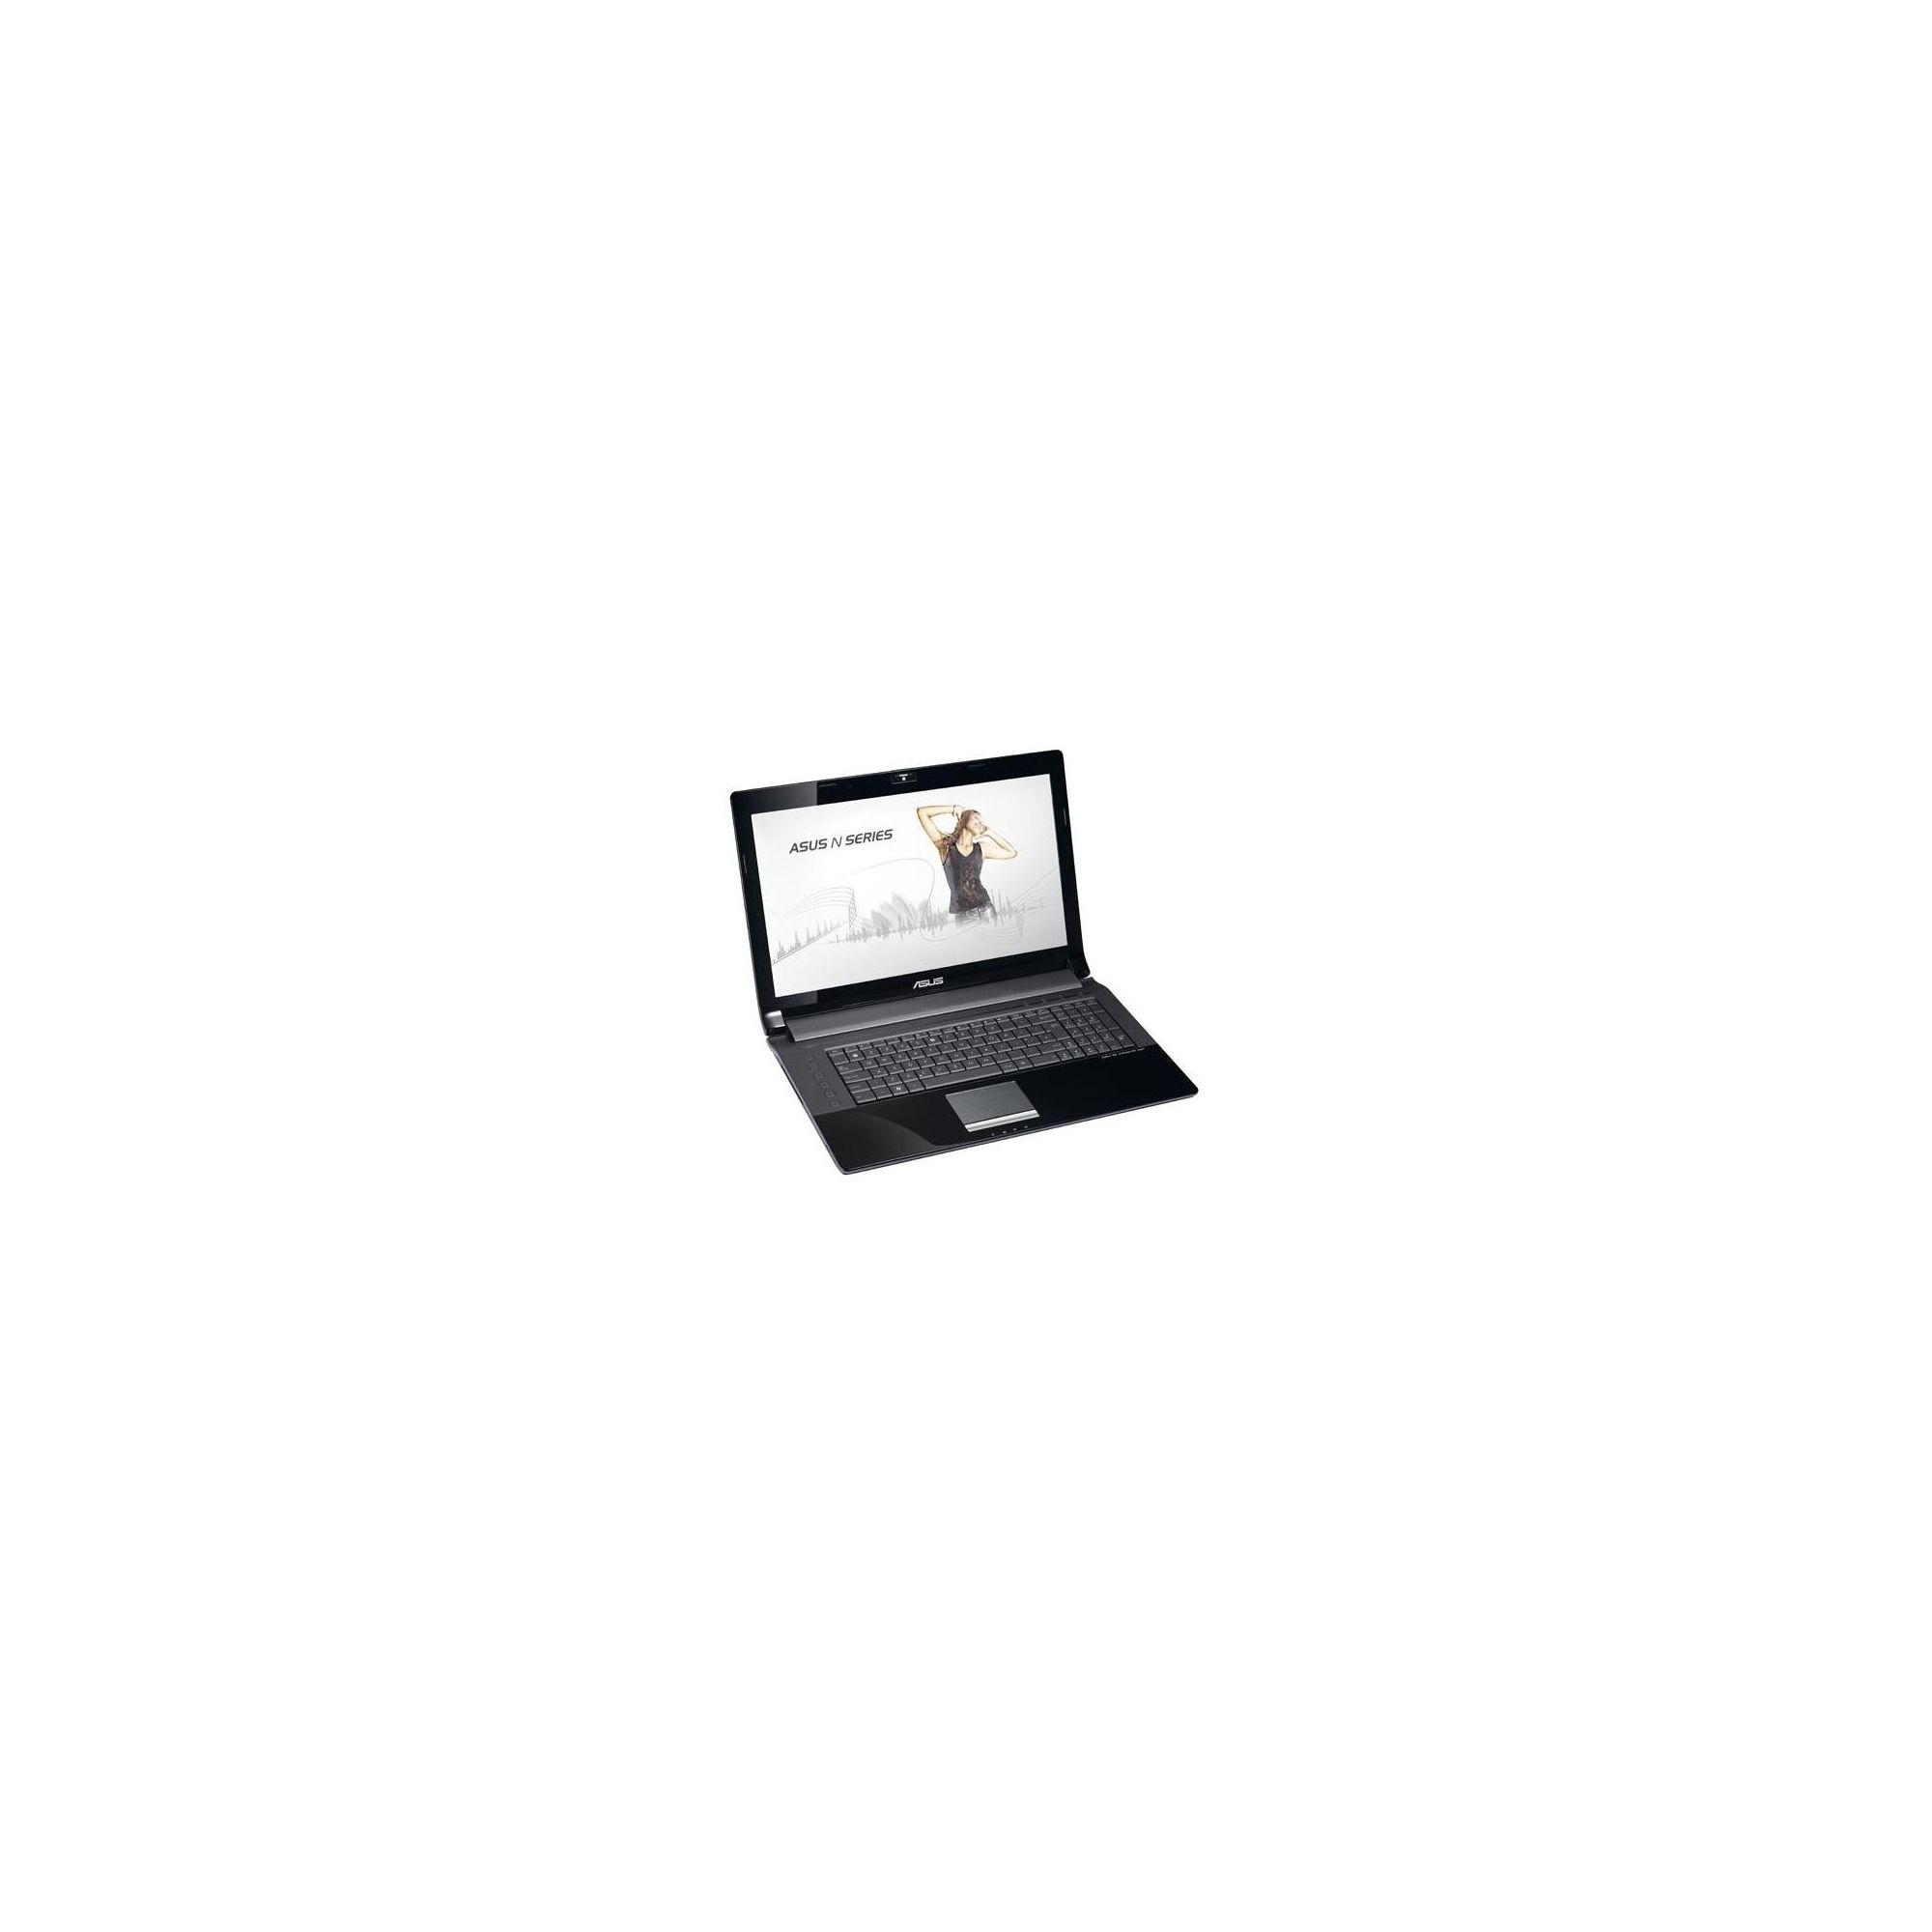 Asus N73JG-TY104V Laptop (4GB, 640GB, 17.3'' Display) at Tesco Direct